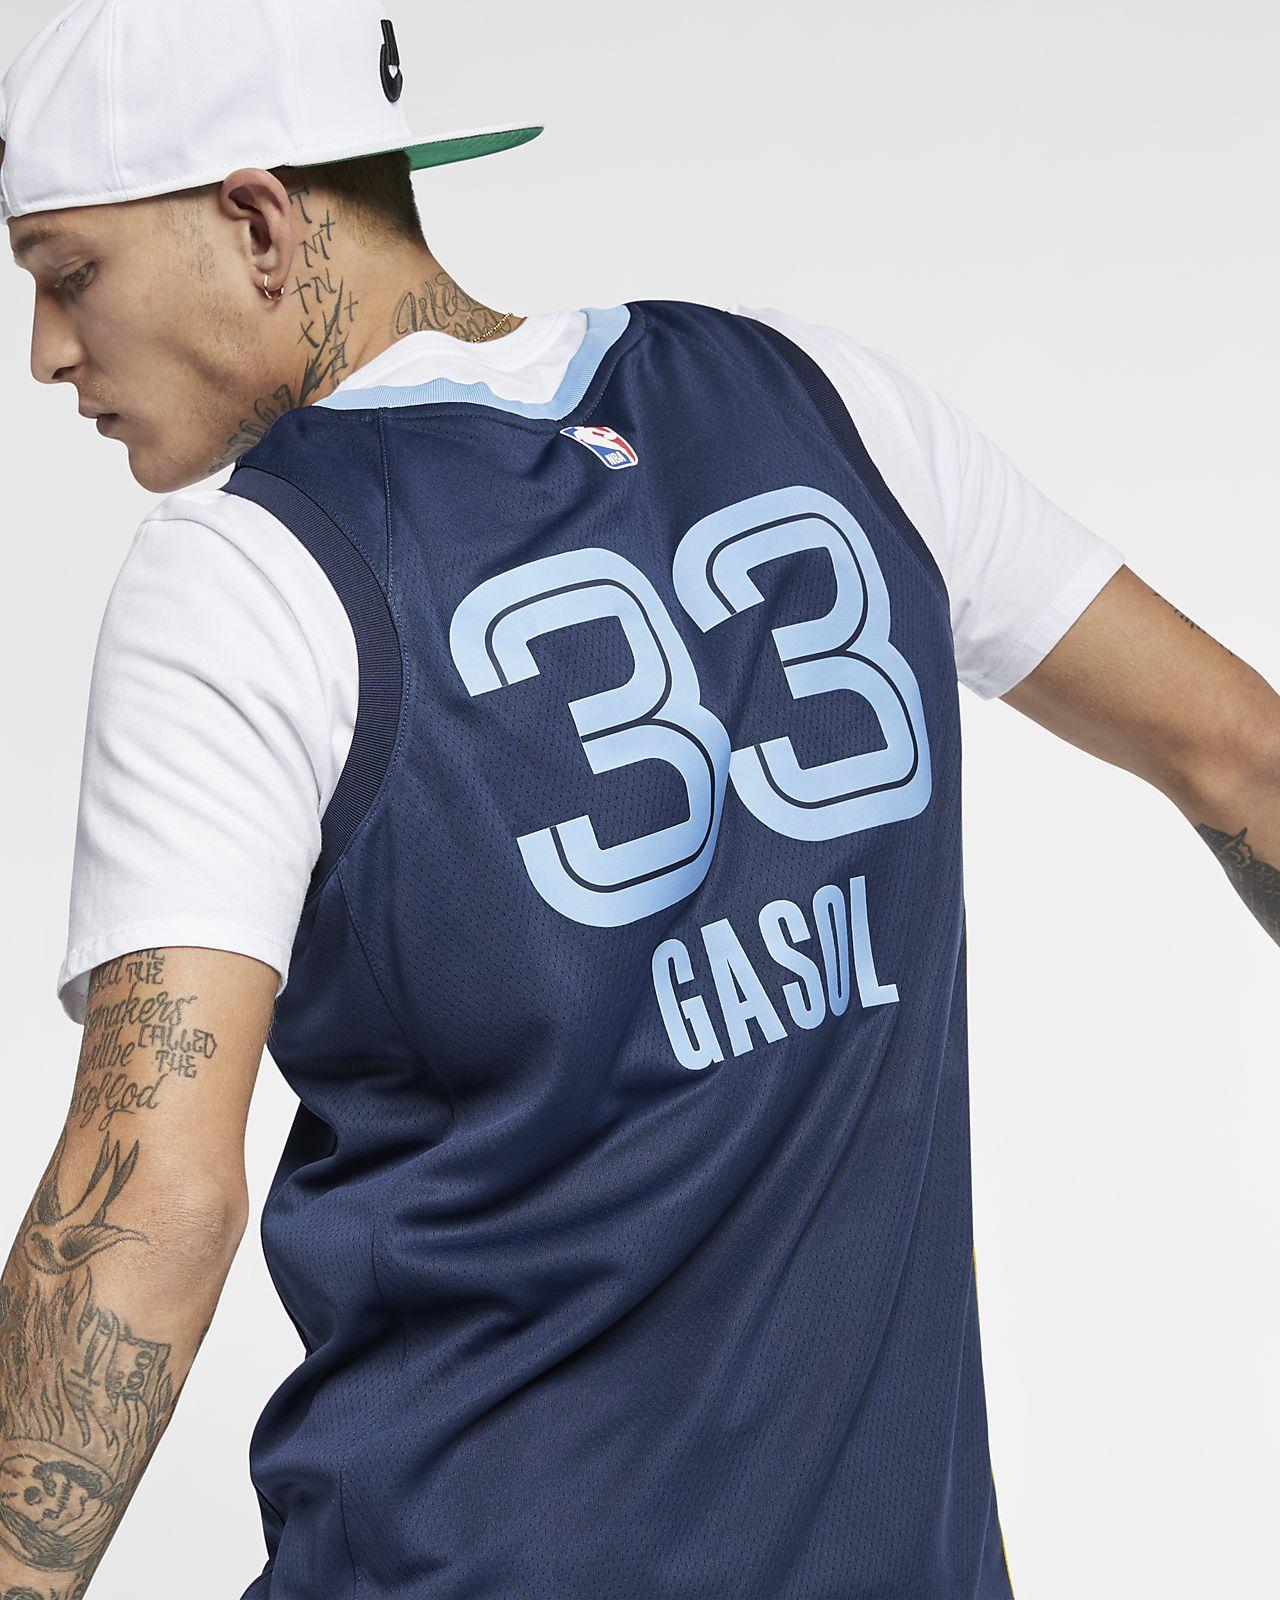 new arrivals 23c2b bf2c9 Marc Gasol Icon Edition Swingman (Memphis Grizzlies) Men's Nike NBA  Connected Jersey